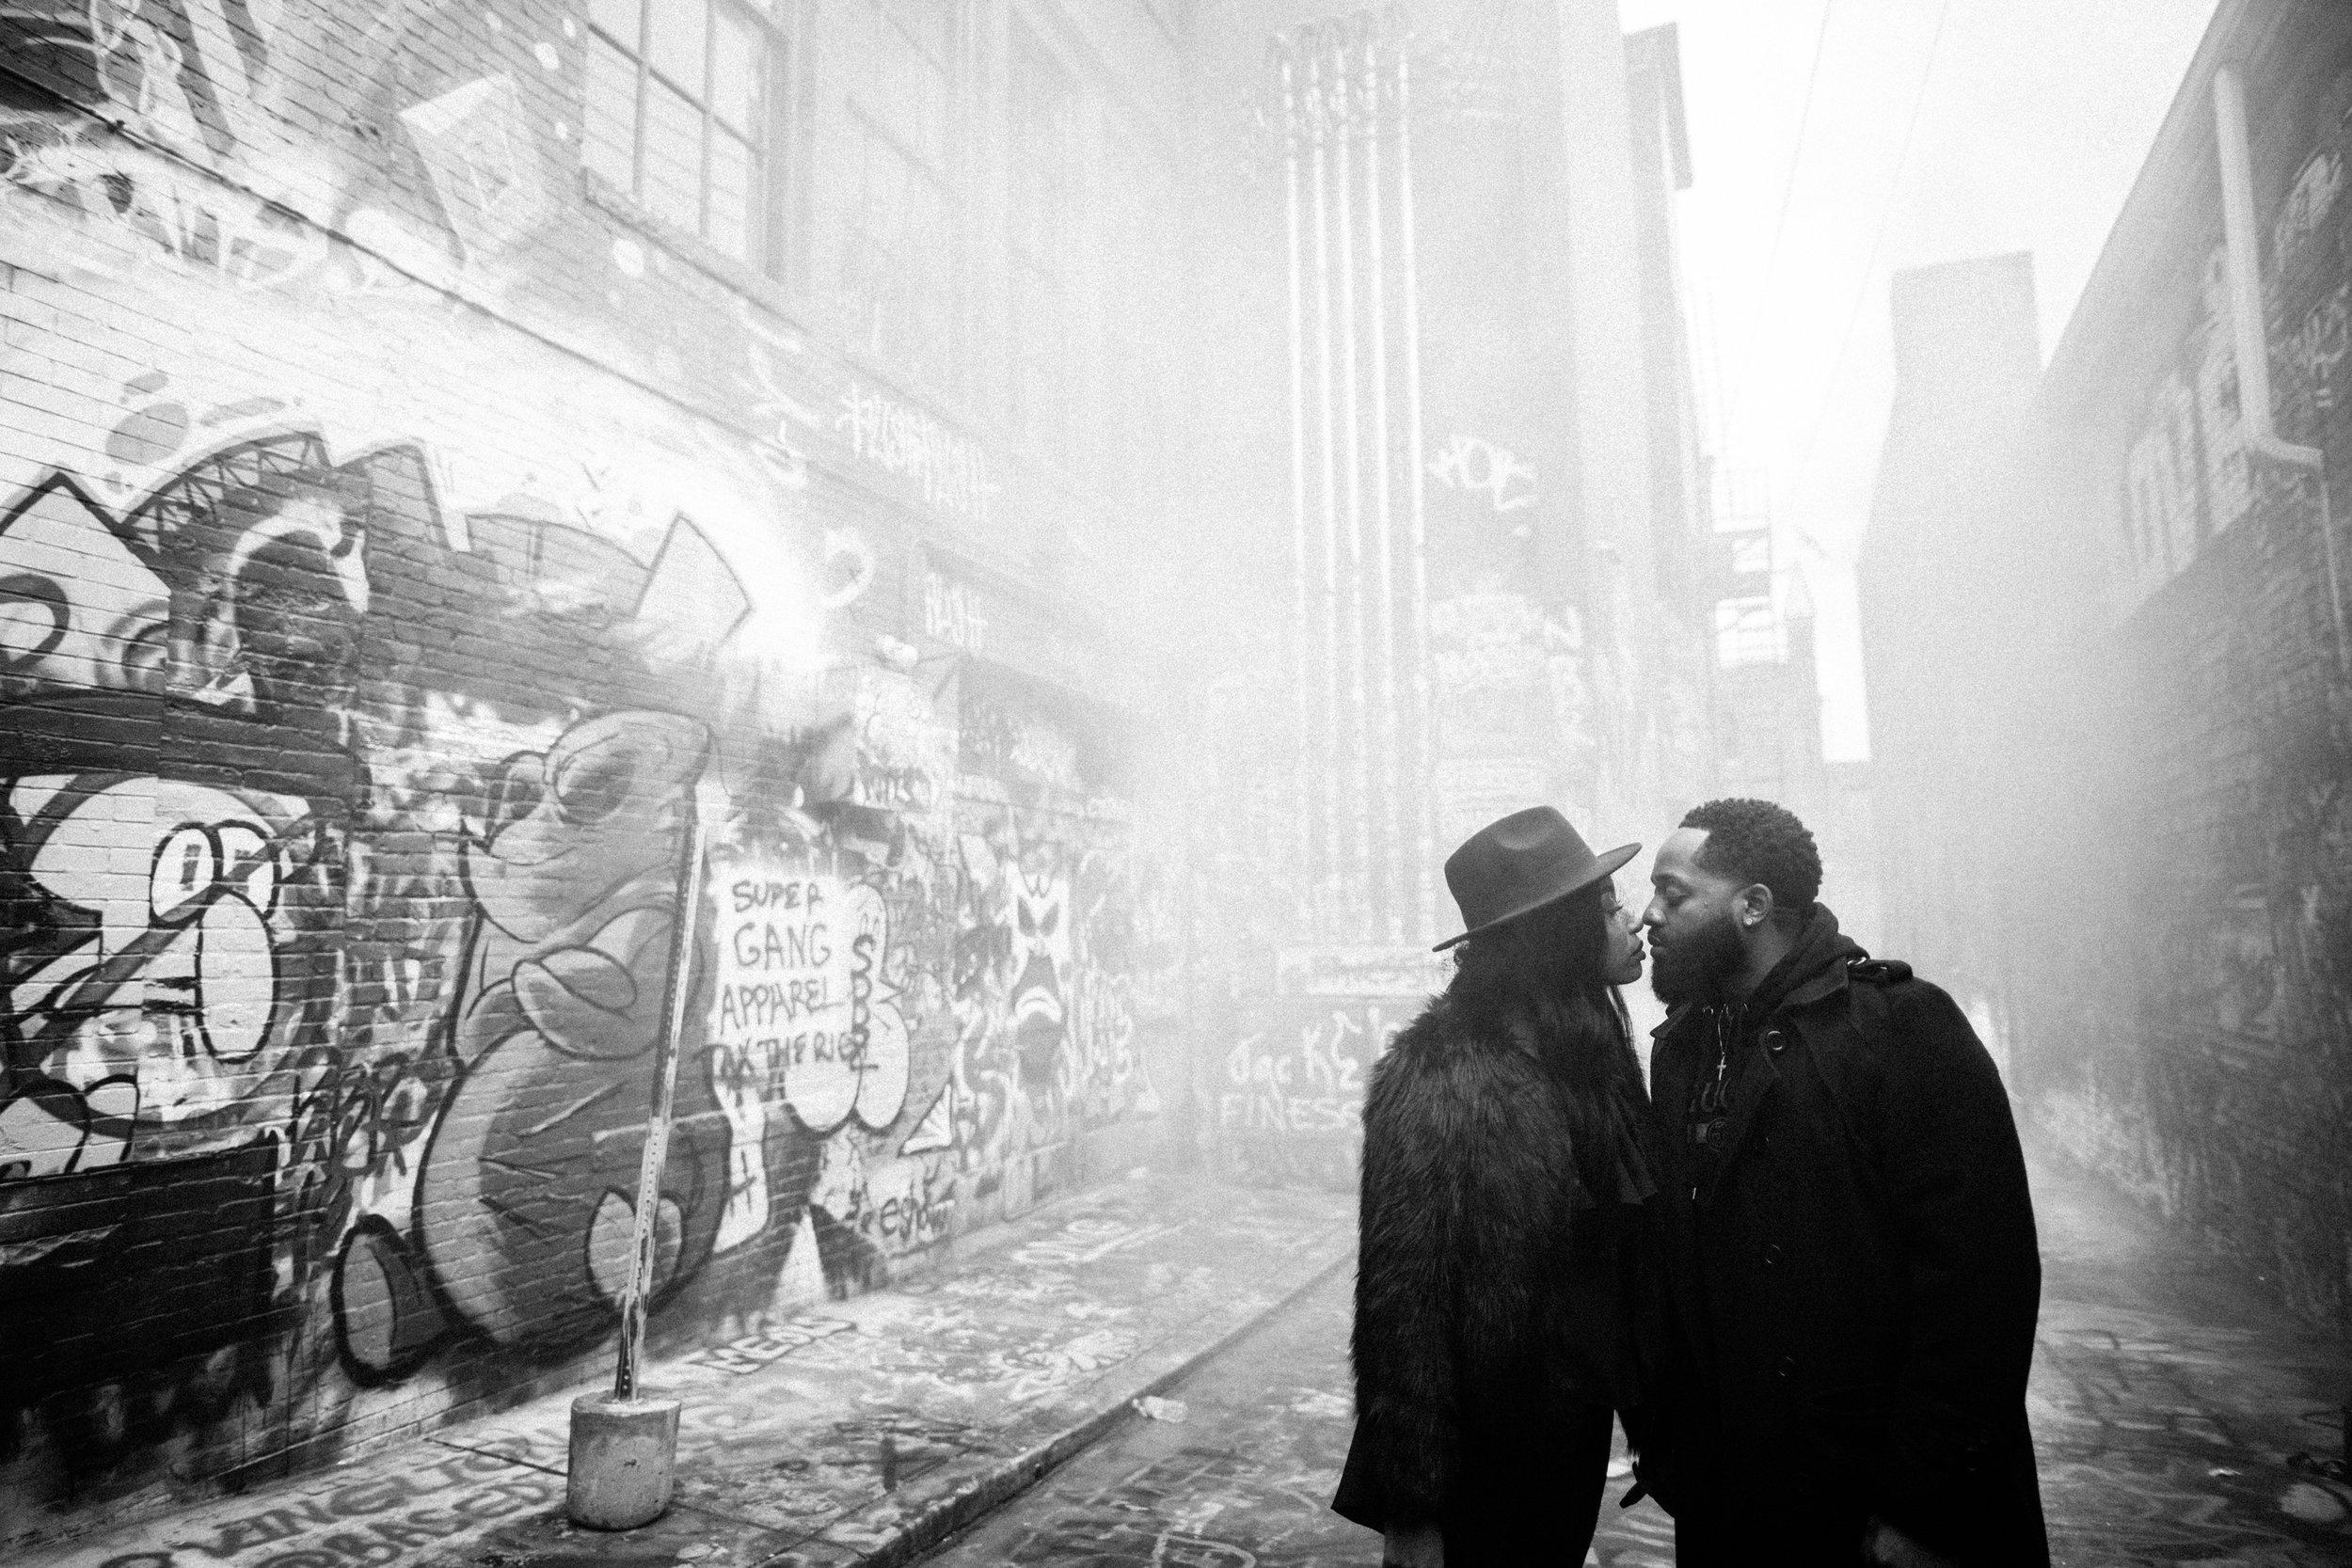 Creative Baltimore Graffiti Alley Engagement Session Megapixels Media Photography-51.jpg